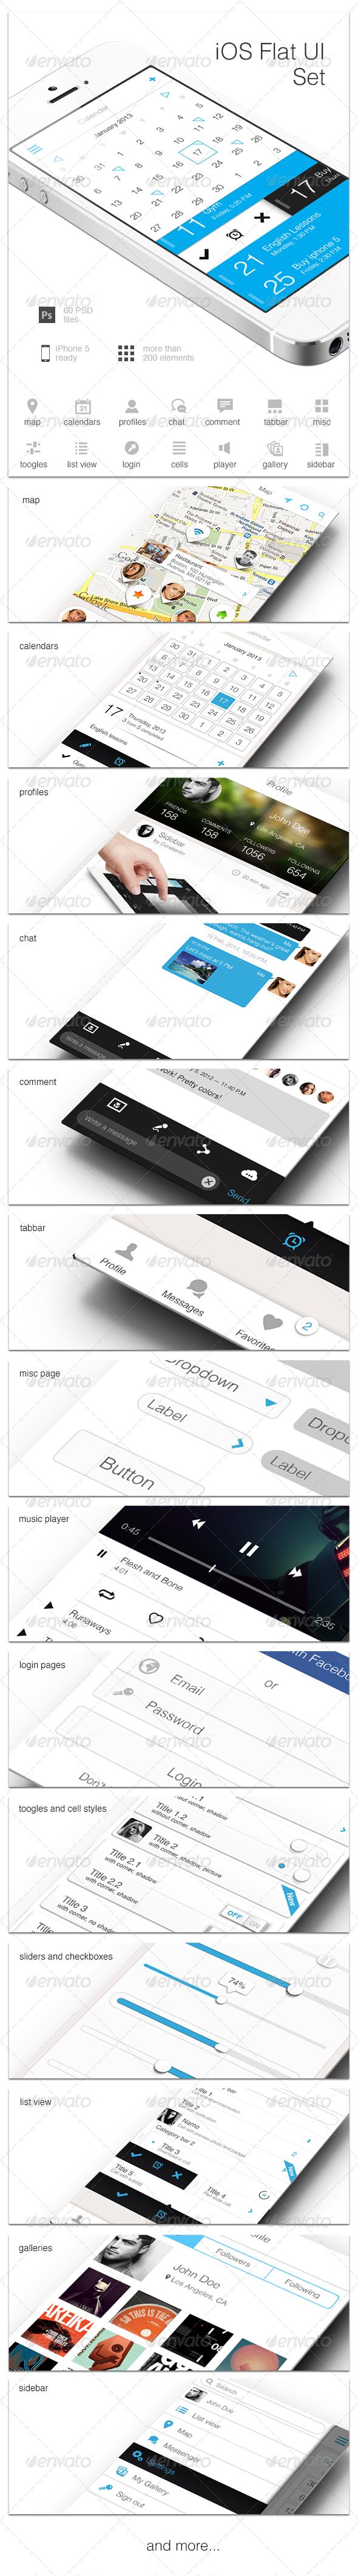 iOS Flat UI Set Vol. 1 - User Interfaces Web Elements